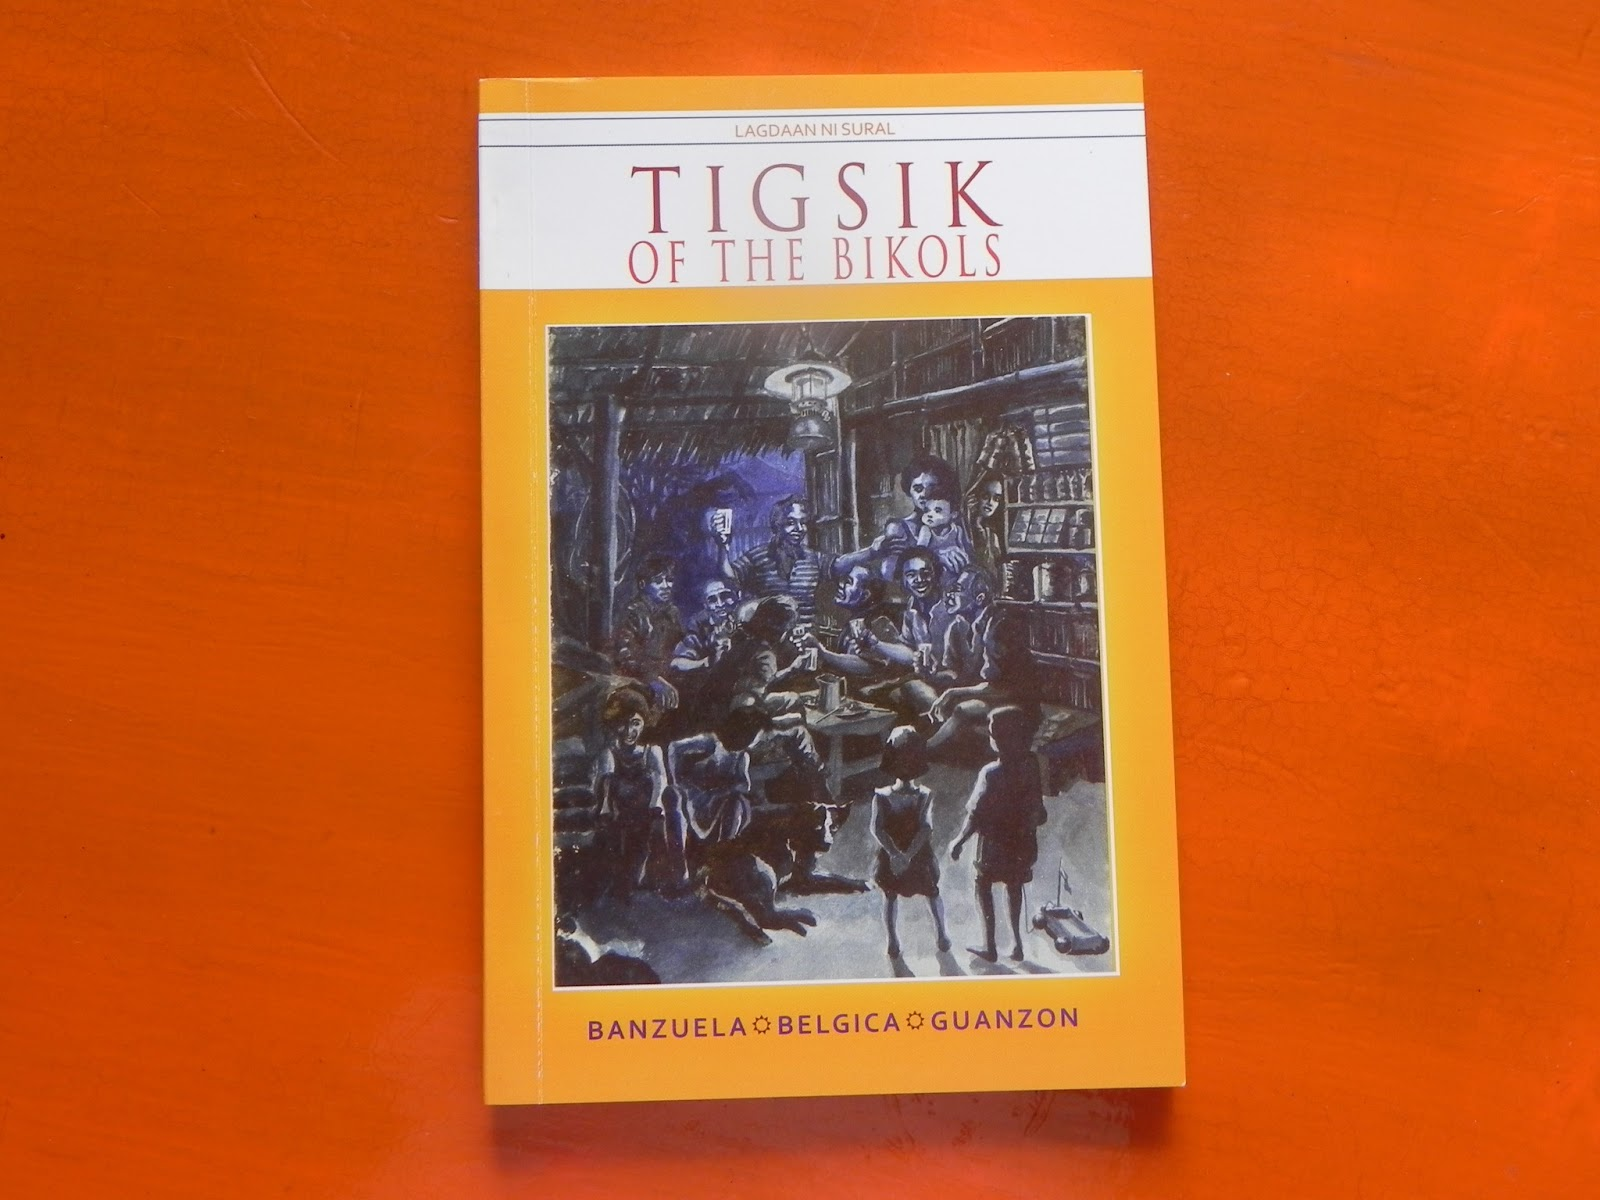 FIBER: TIGSIK OF THE BIKOLS